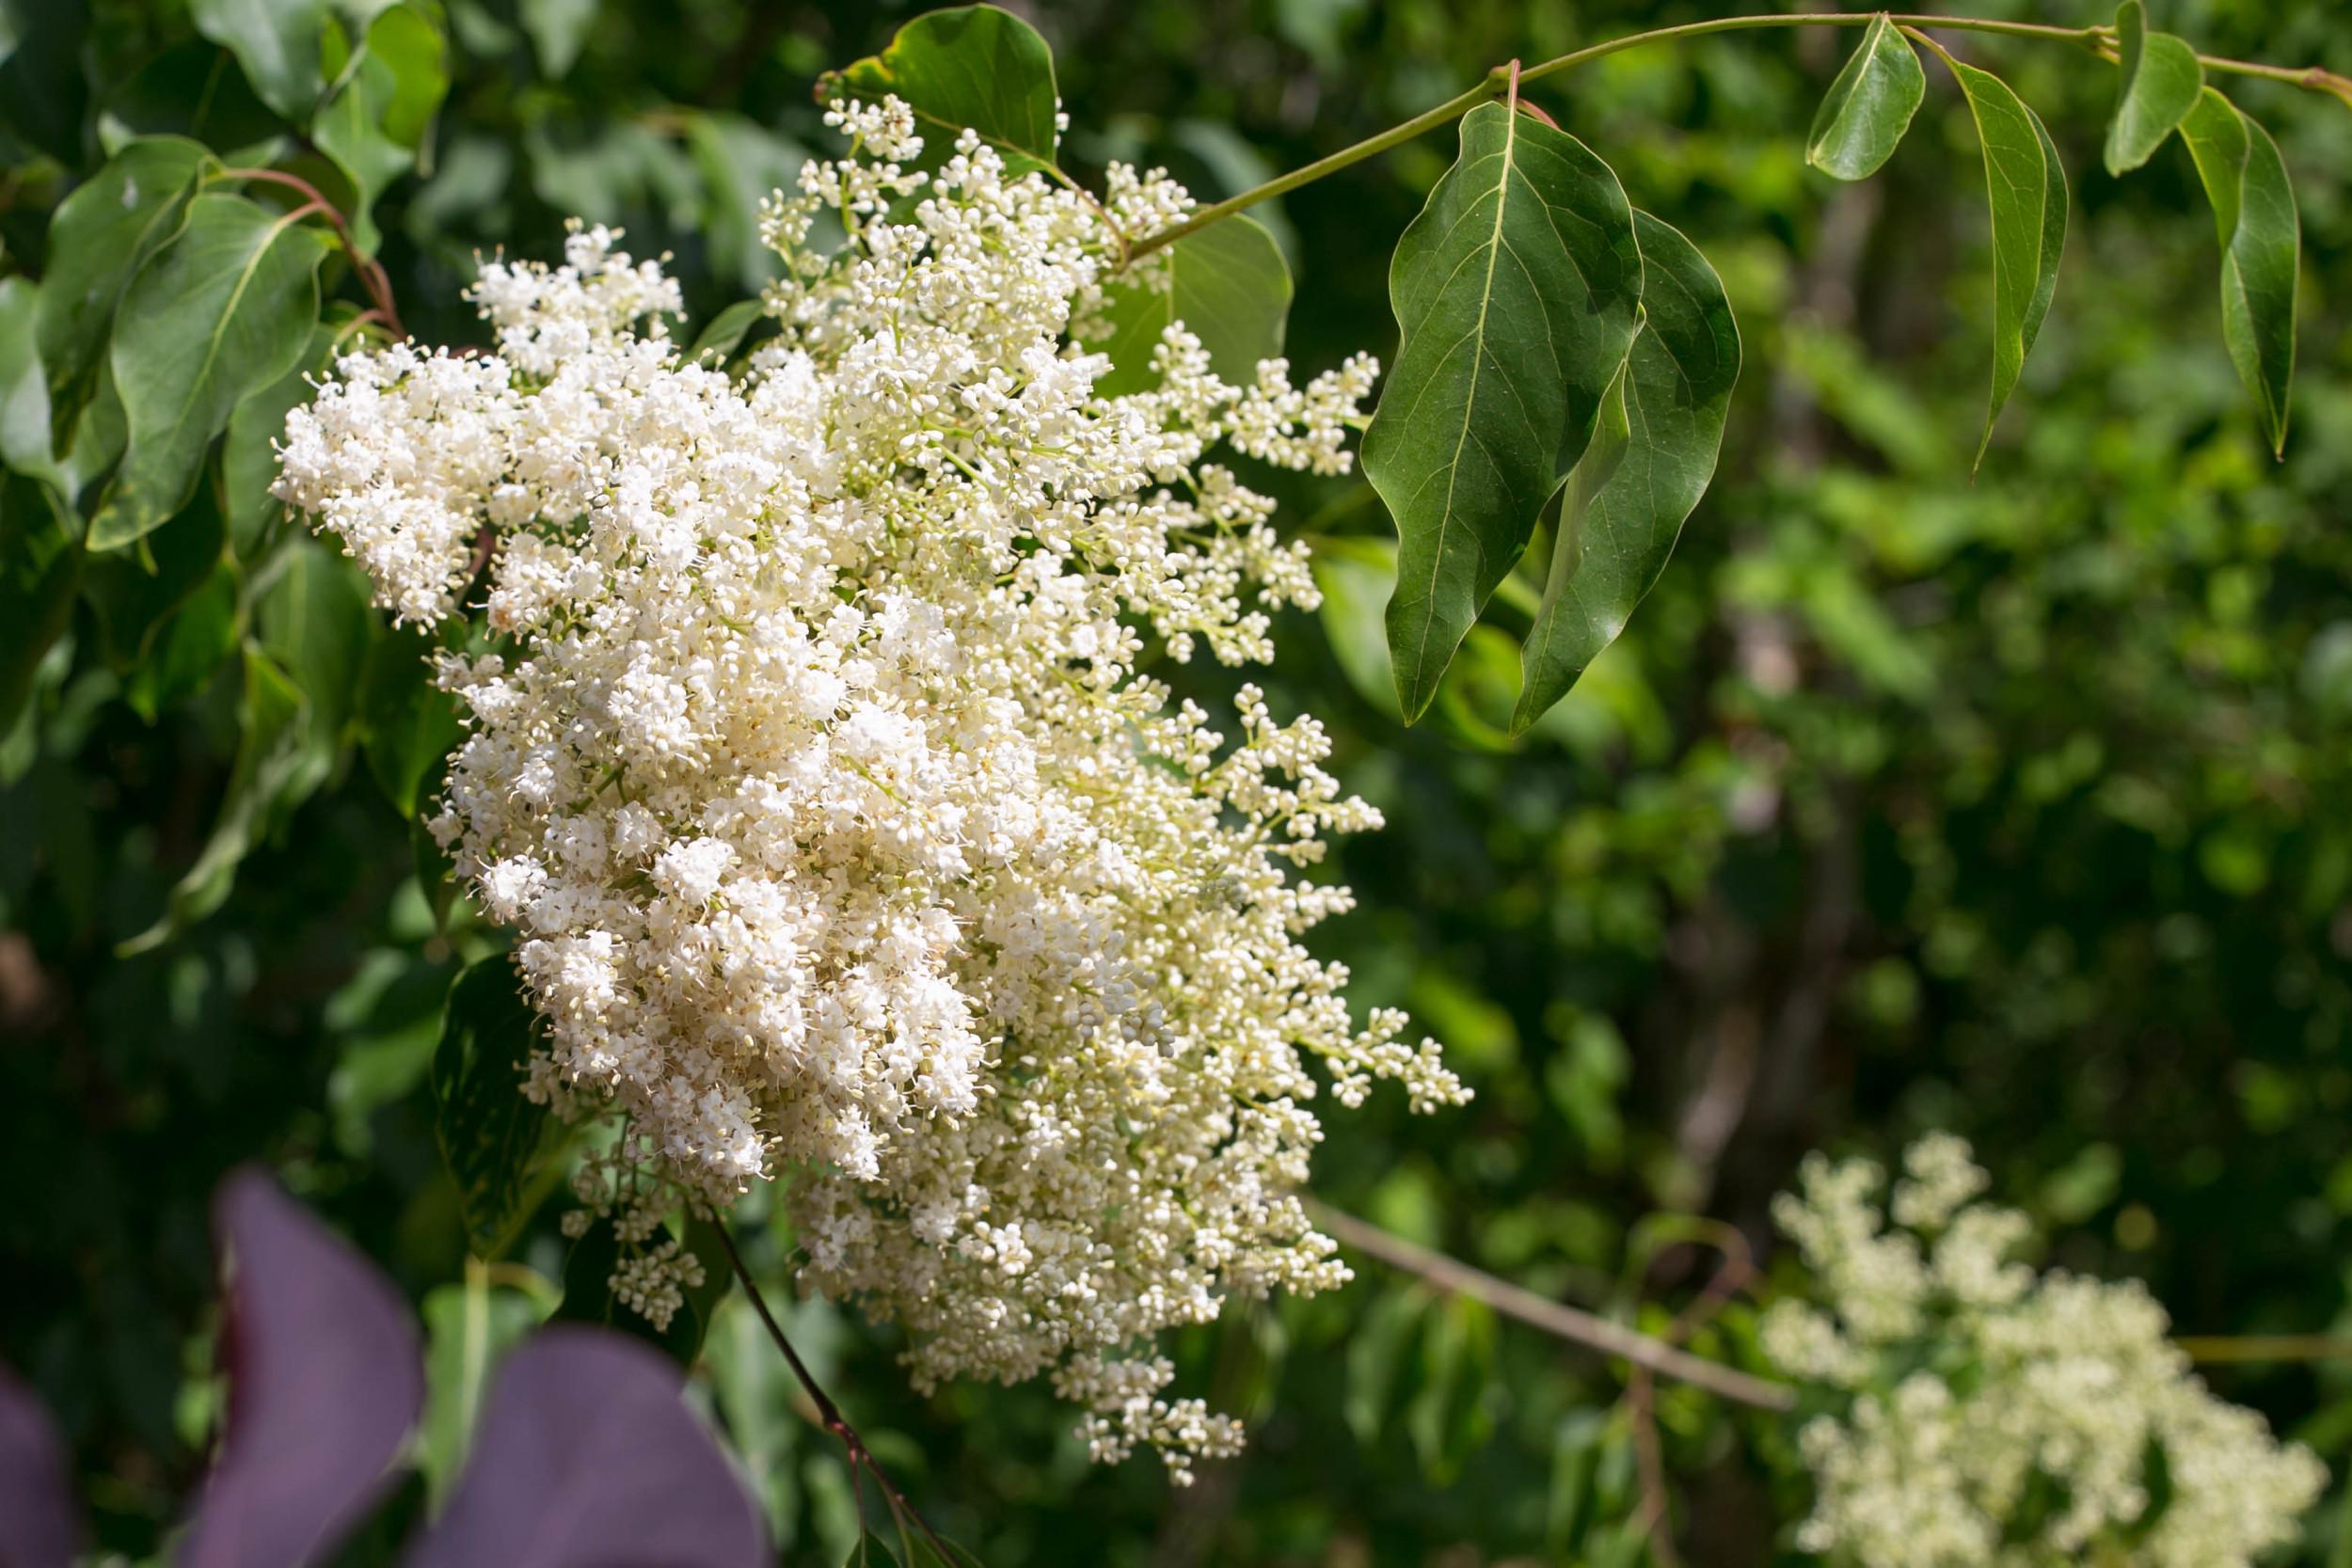 Peking Lilac (Syringa pekinesis)has large, creamy-white, honey-scented flower clusters